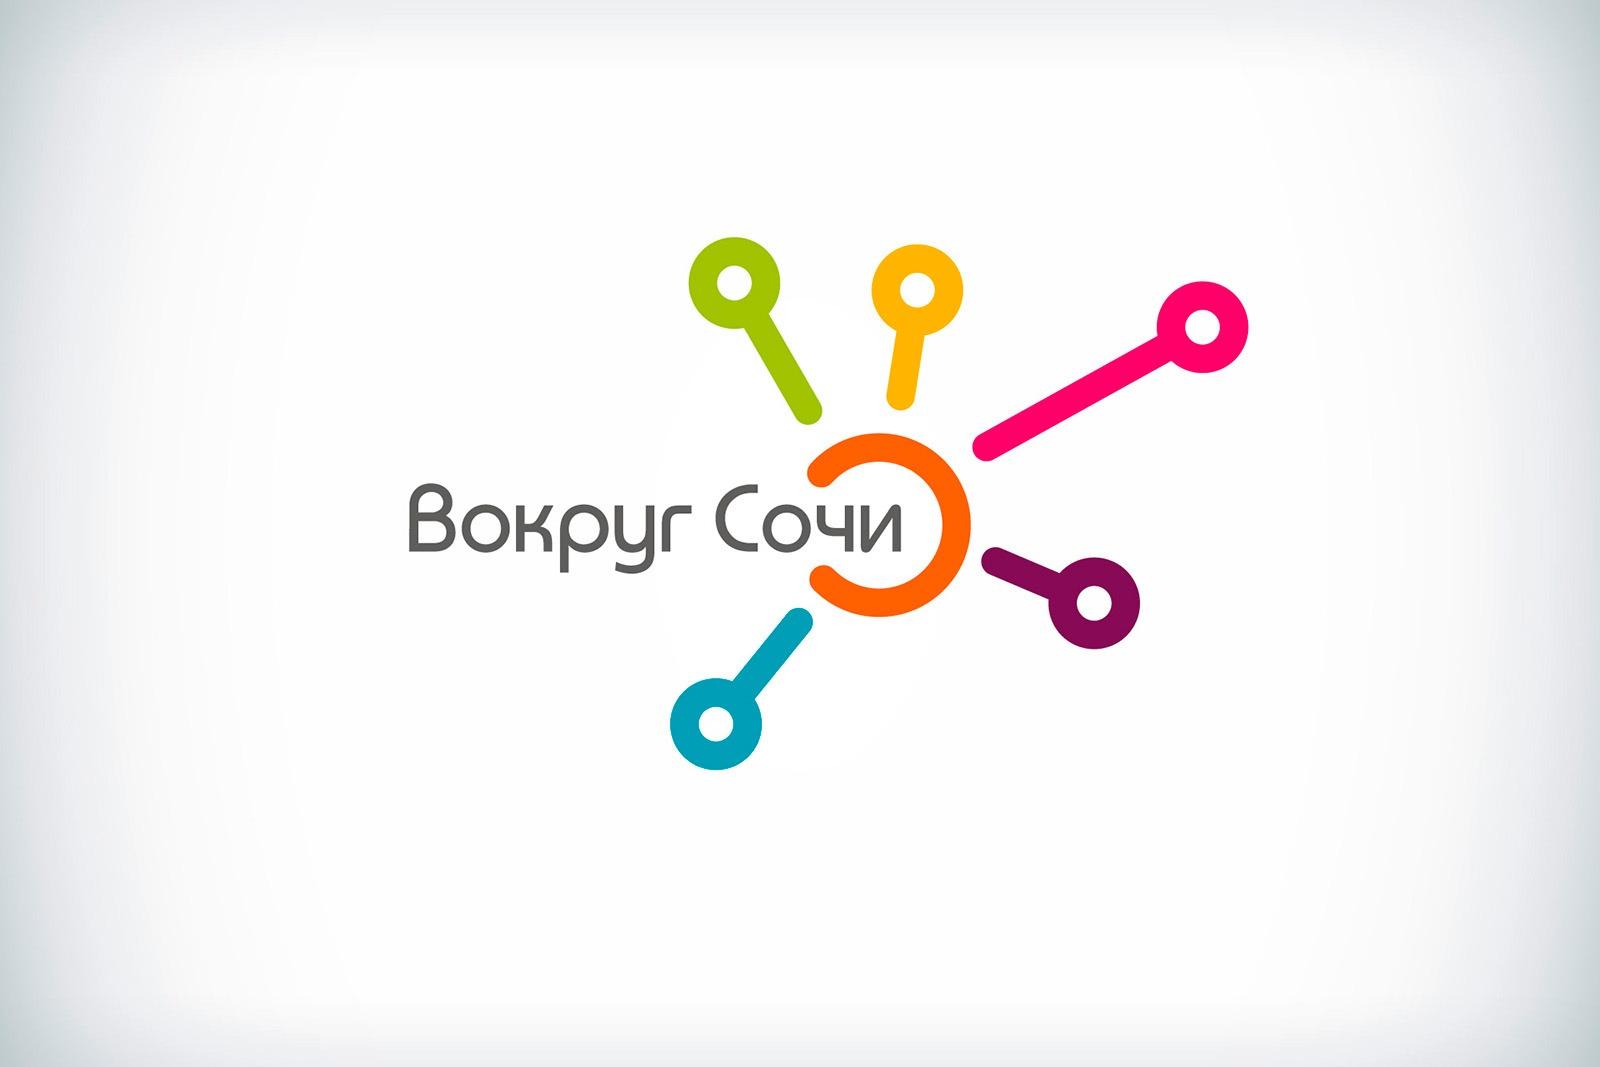 Дизайн логотипа туристического агентства, Лого, Вокруг Сочи, туристическое агентство, брендинг, фирменный стиль туристического агентства